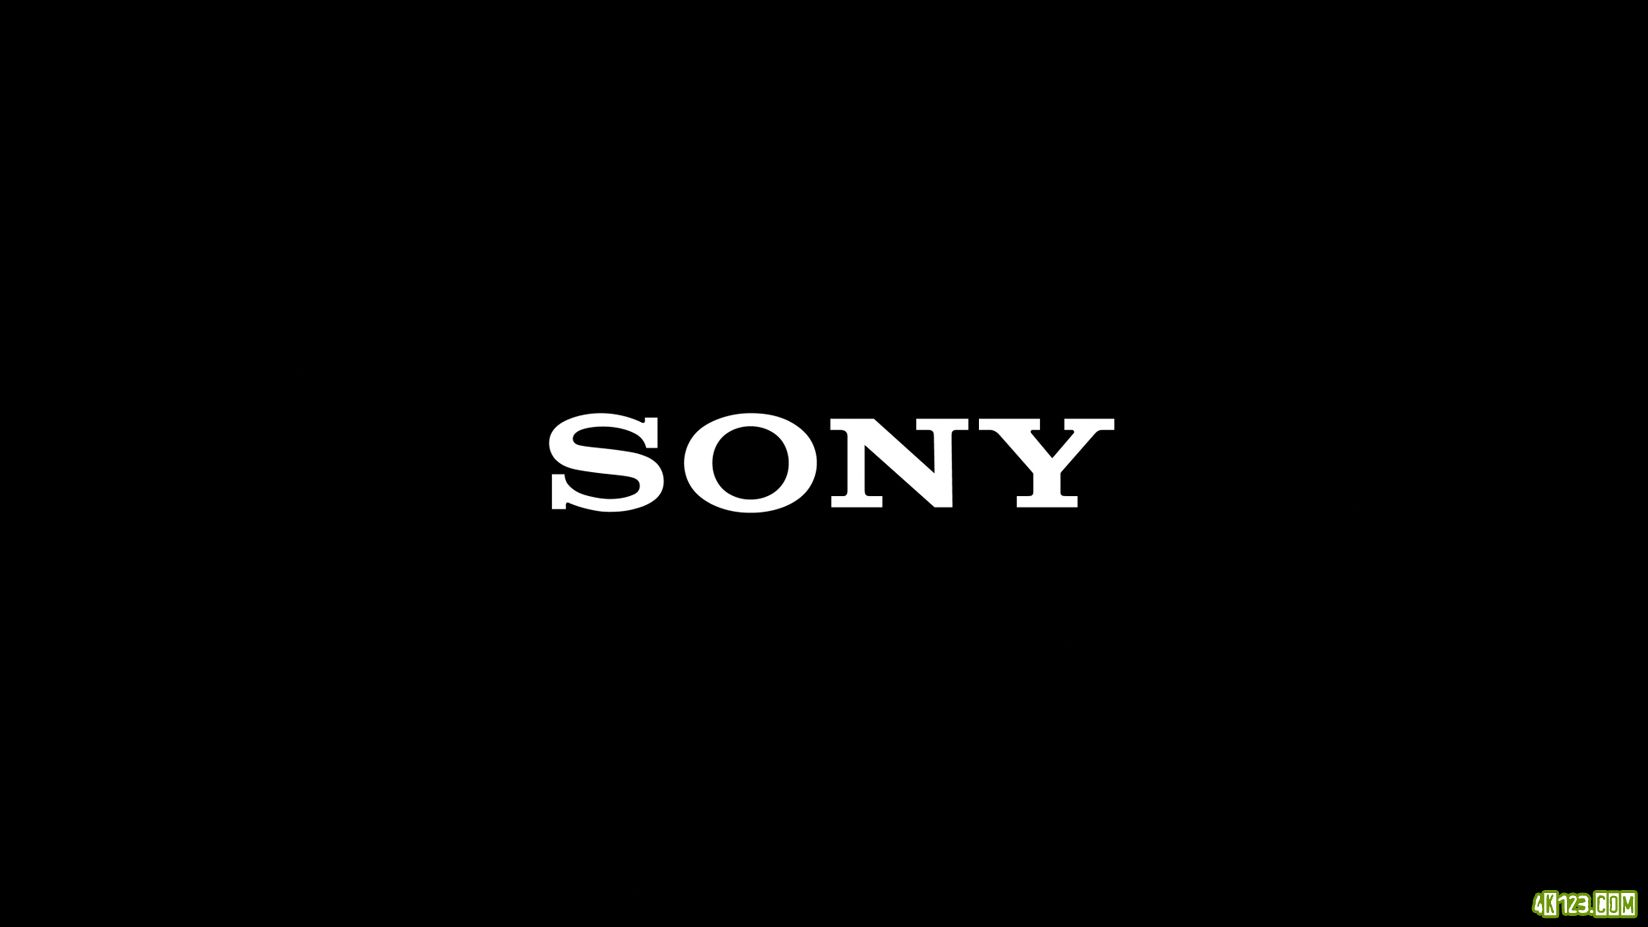 SONY.BRAVIA.OLED.4K.HDR.DEMO_Food .Fizzle.mp4_2017_13.jpg